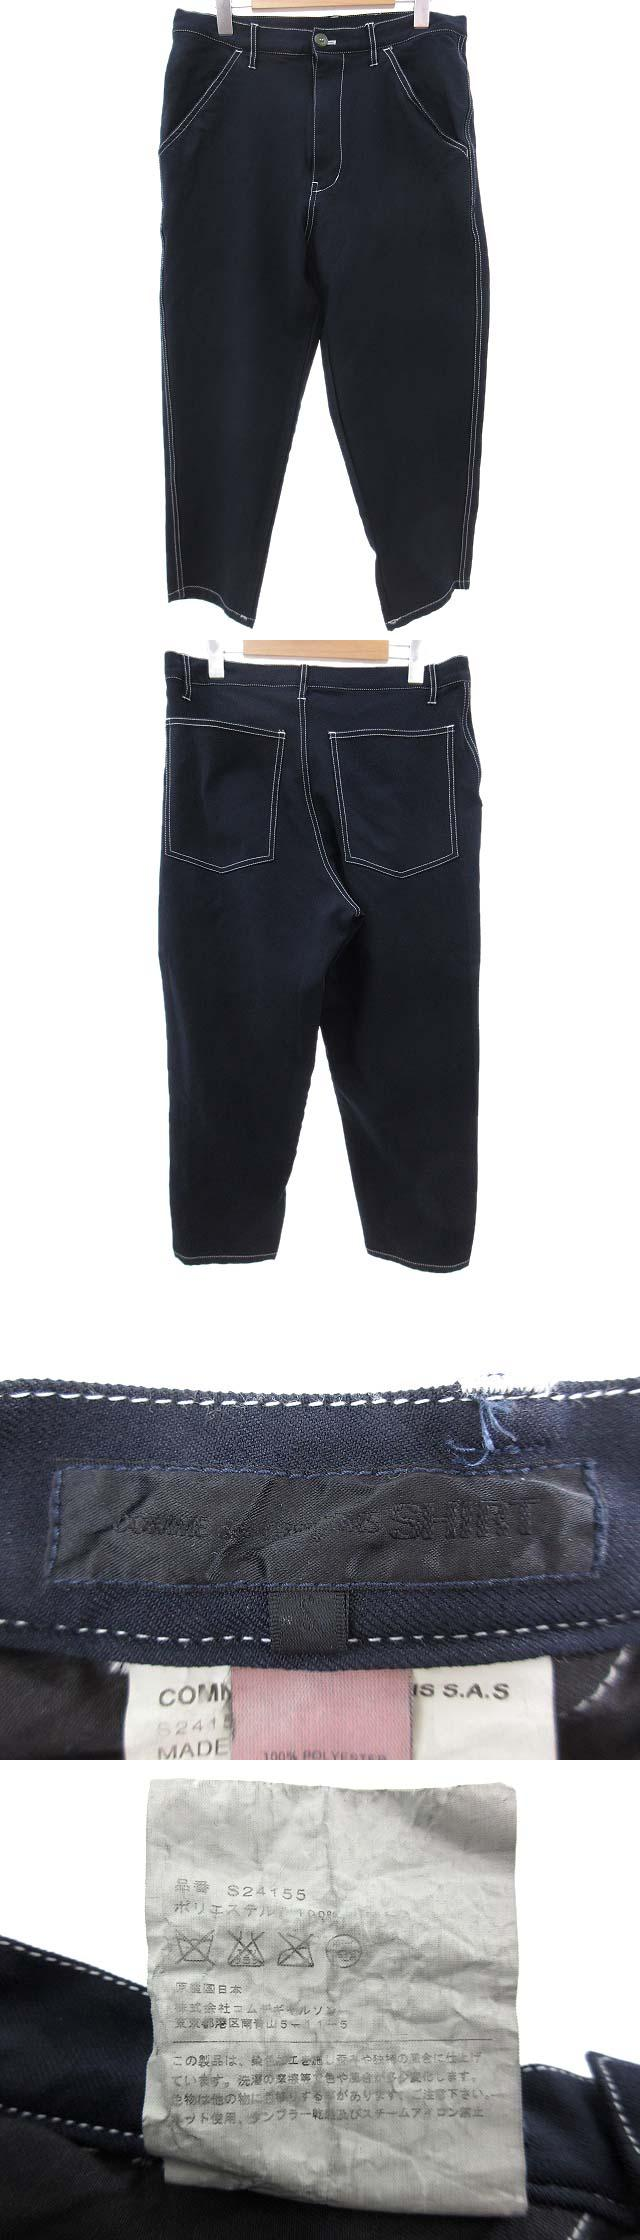 16SS Polyester Gabardine Pants ポリ縮絨クロップドパンツ テーパード ストレッチ カラーステッチ 紺 ネイビー S Y8944